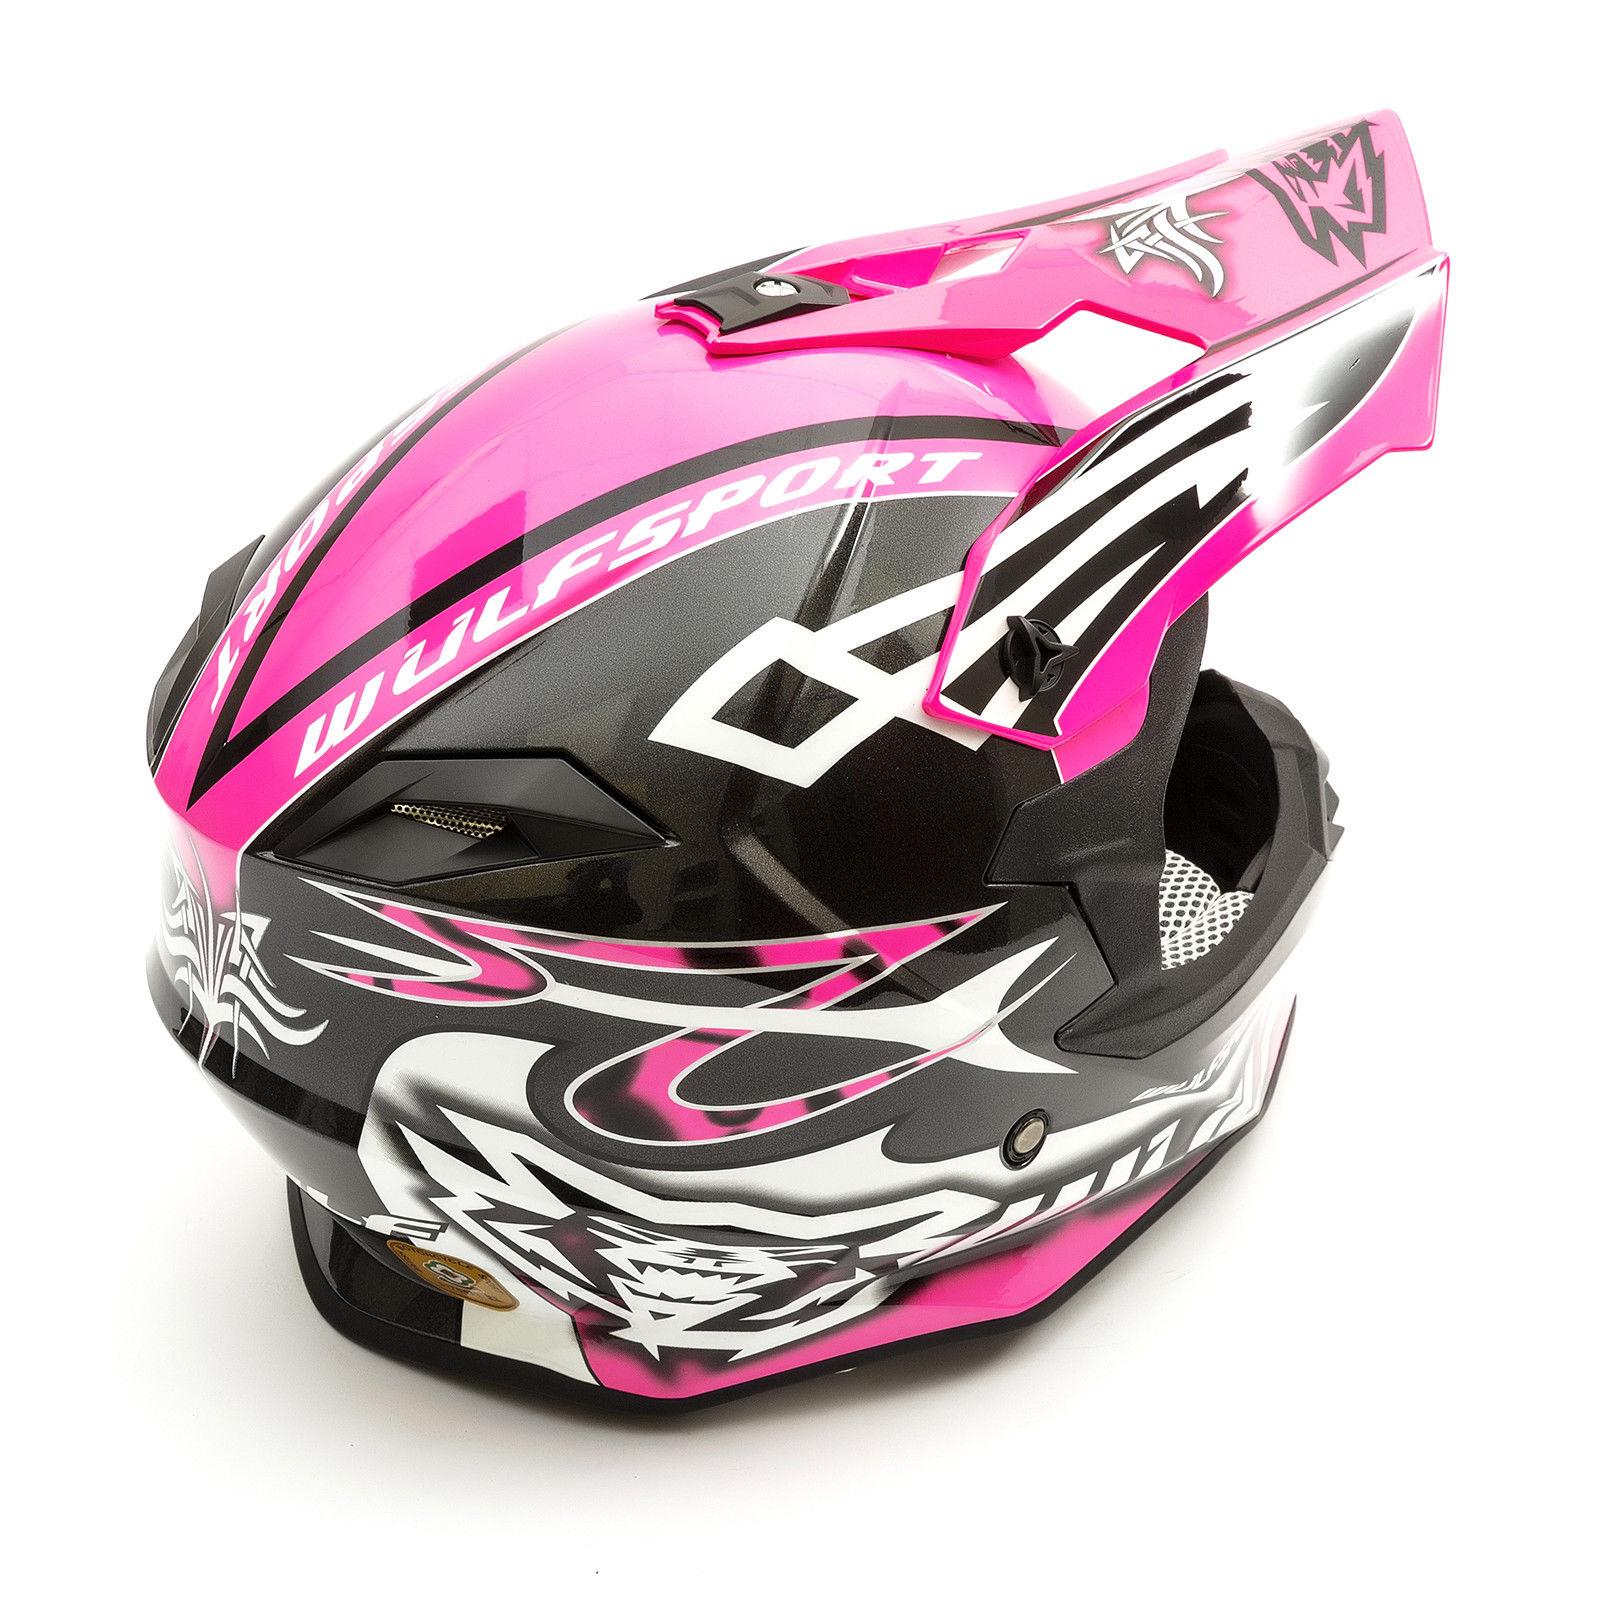 Wulfsport-Adult-Sceptre-Helmets-Motocross-Pitbike-Motorbike-Off-Road-Racing-ATV thumbnail 43